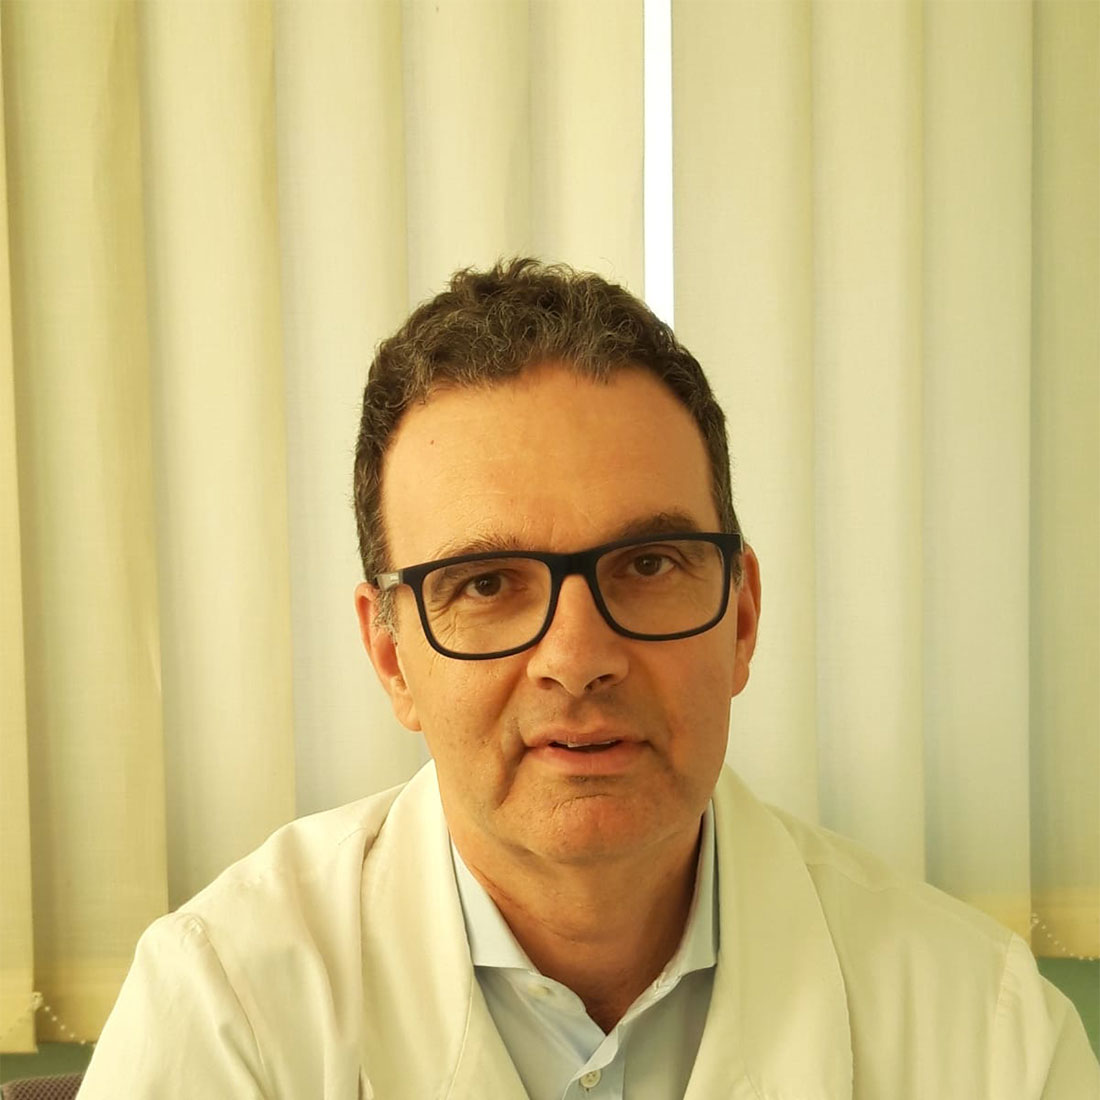 Edoardo Cantilena